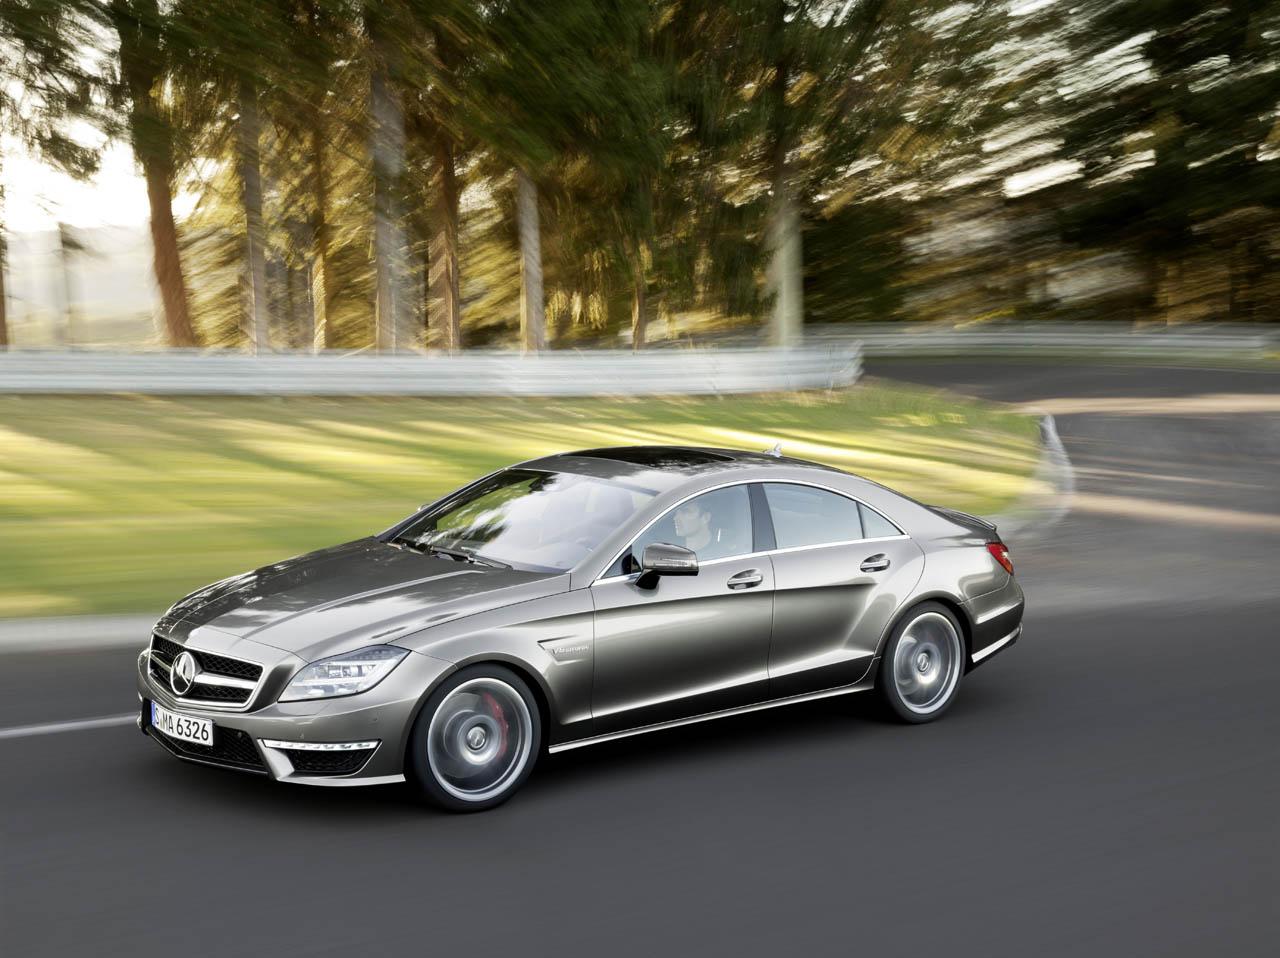 http://4.bp.blogspot.com/-2kjKPsu5pH4/TnG1AAOn5TI/AAAAAAAAF28/GKpSN6wXN6o/s1600/2012-Mercedes-Benz-CLS63-AMG-Car-Wallpaper.jpg